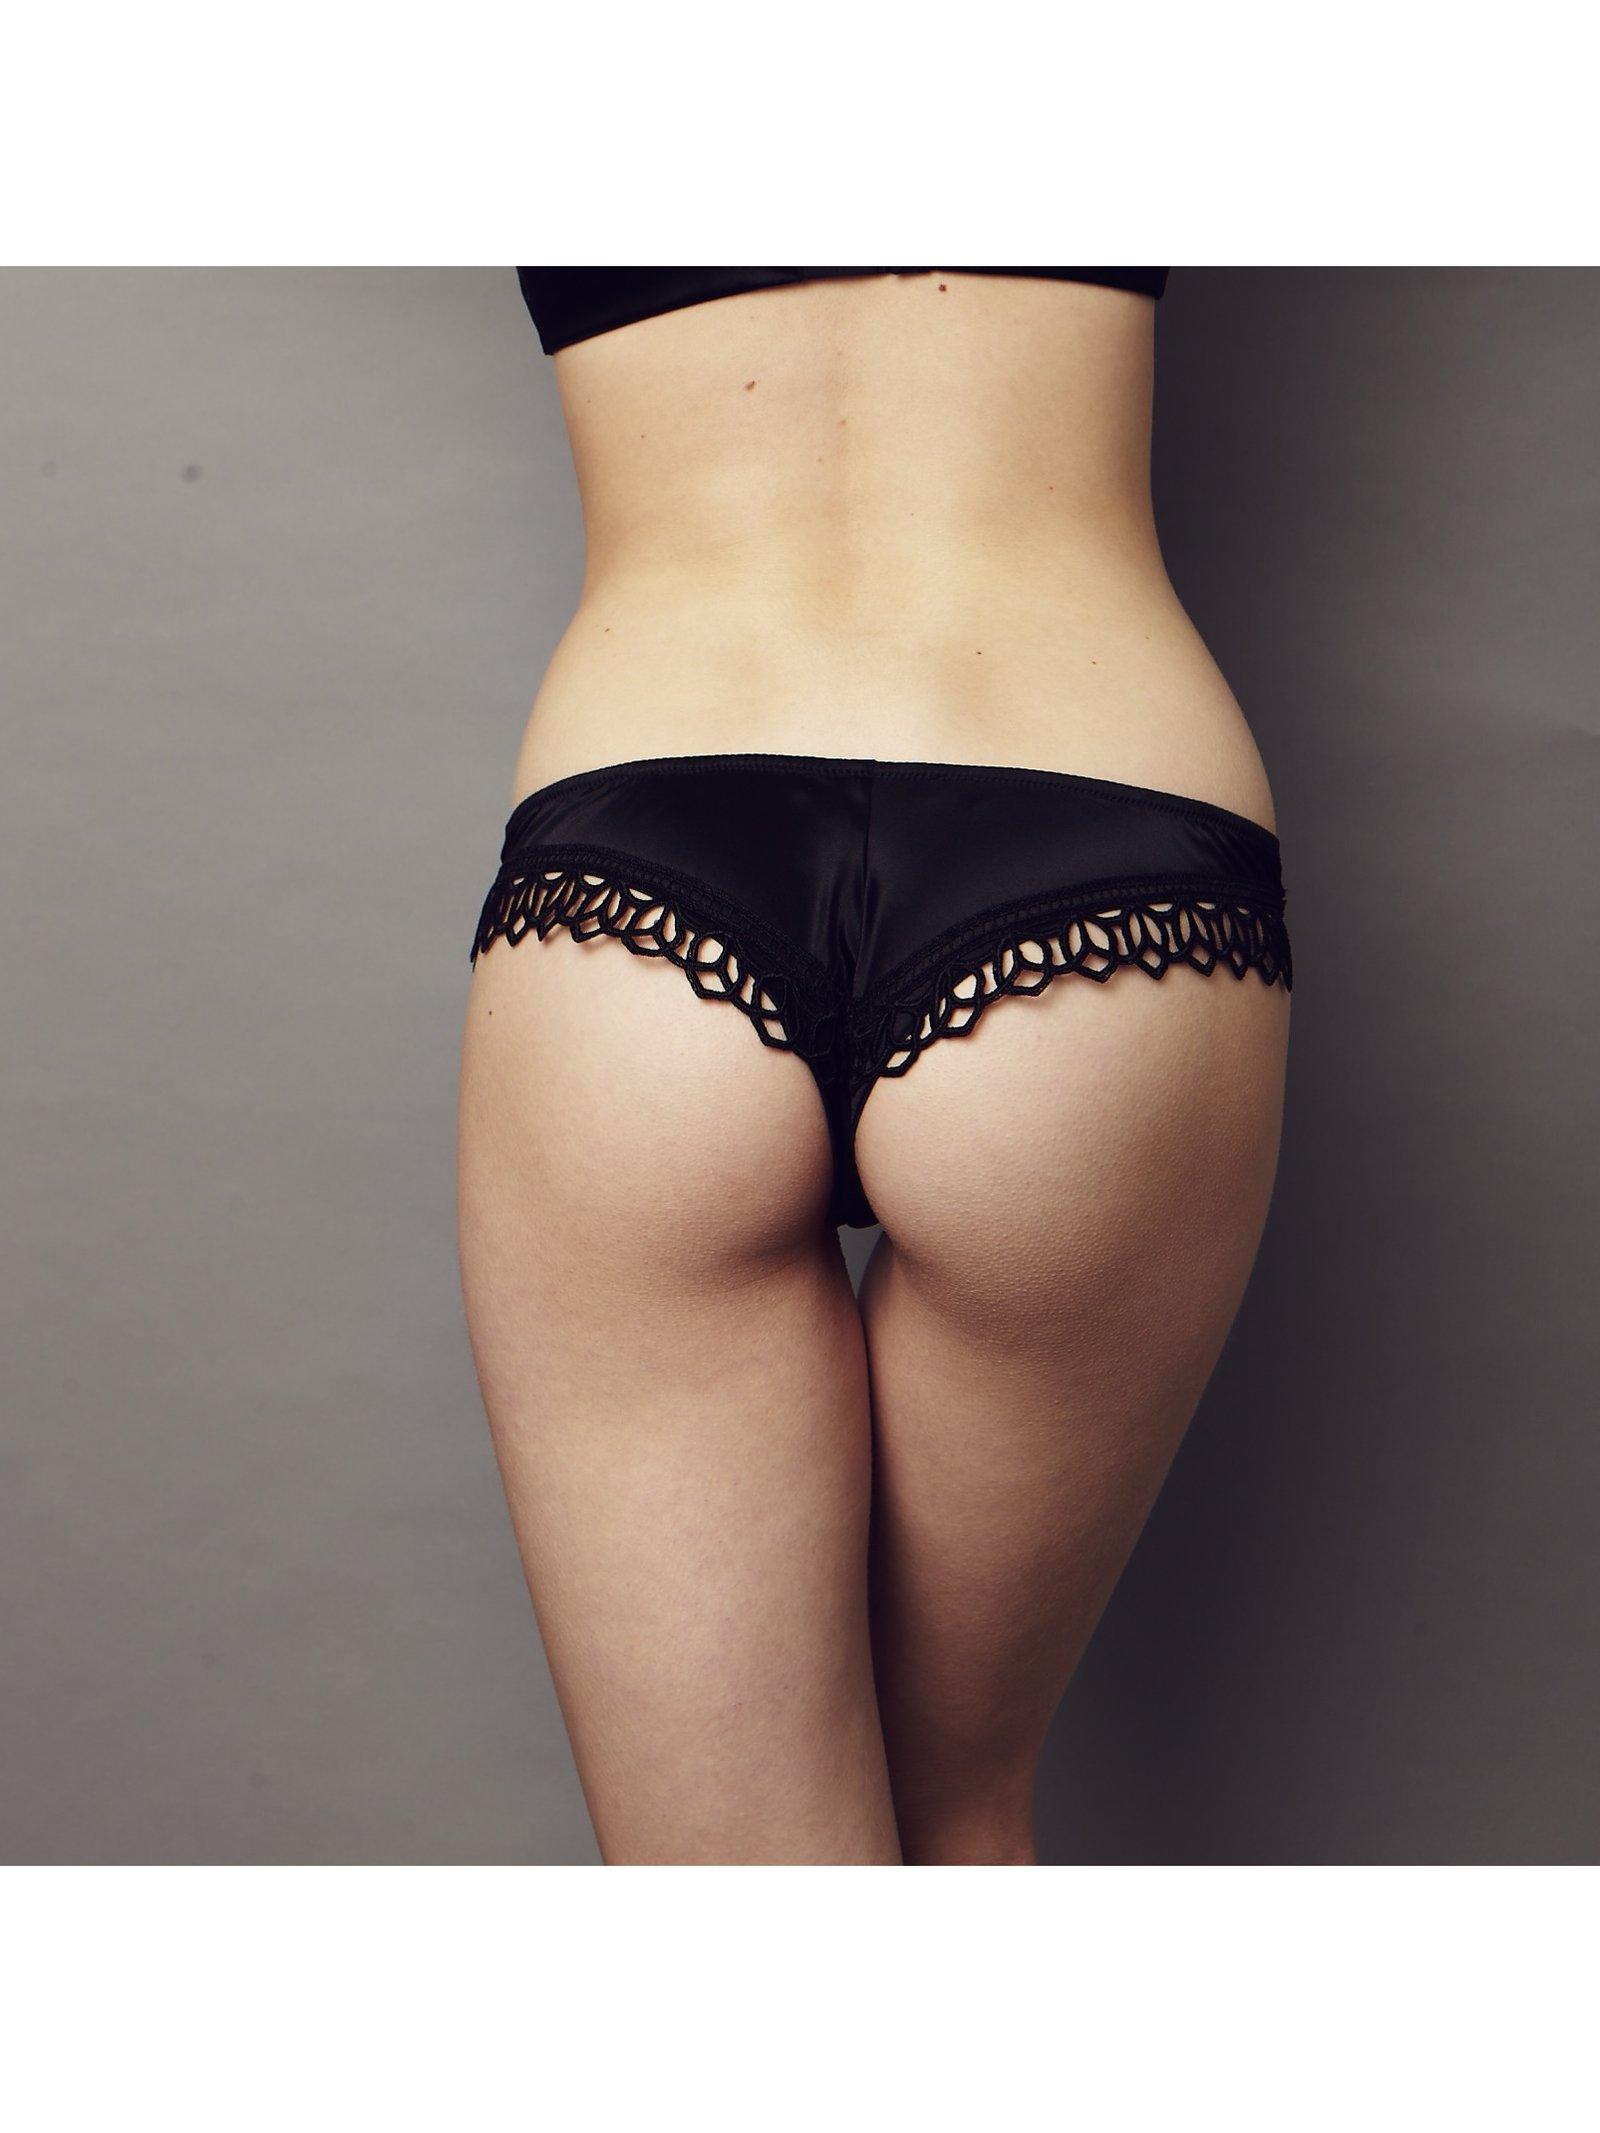 NightProwl Elysium Thong Lace Back